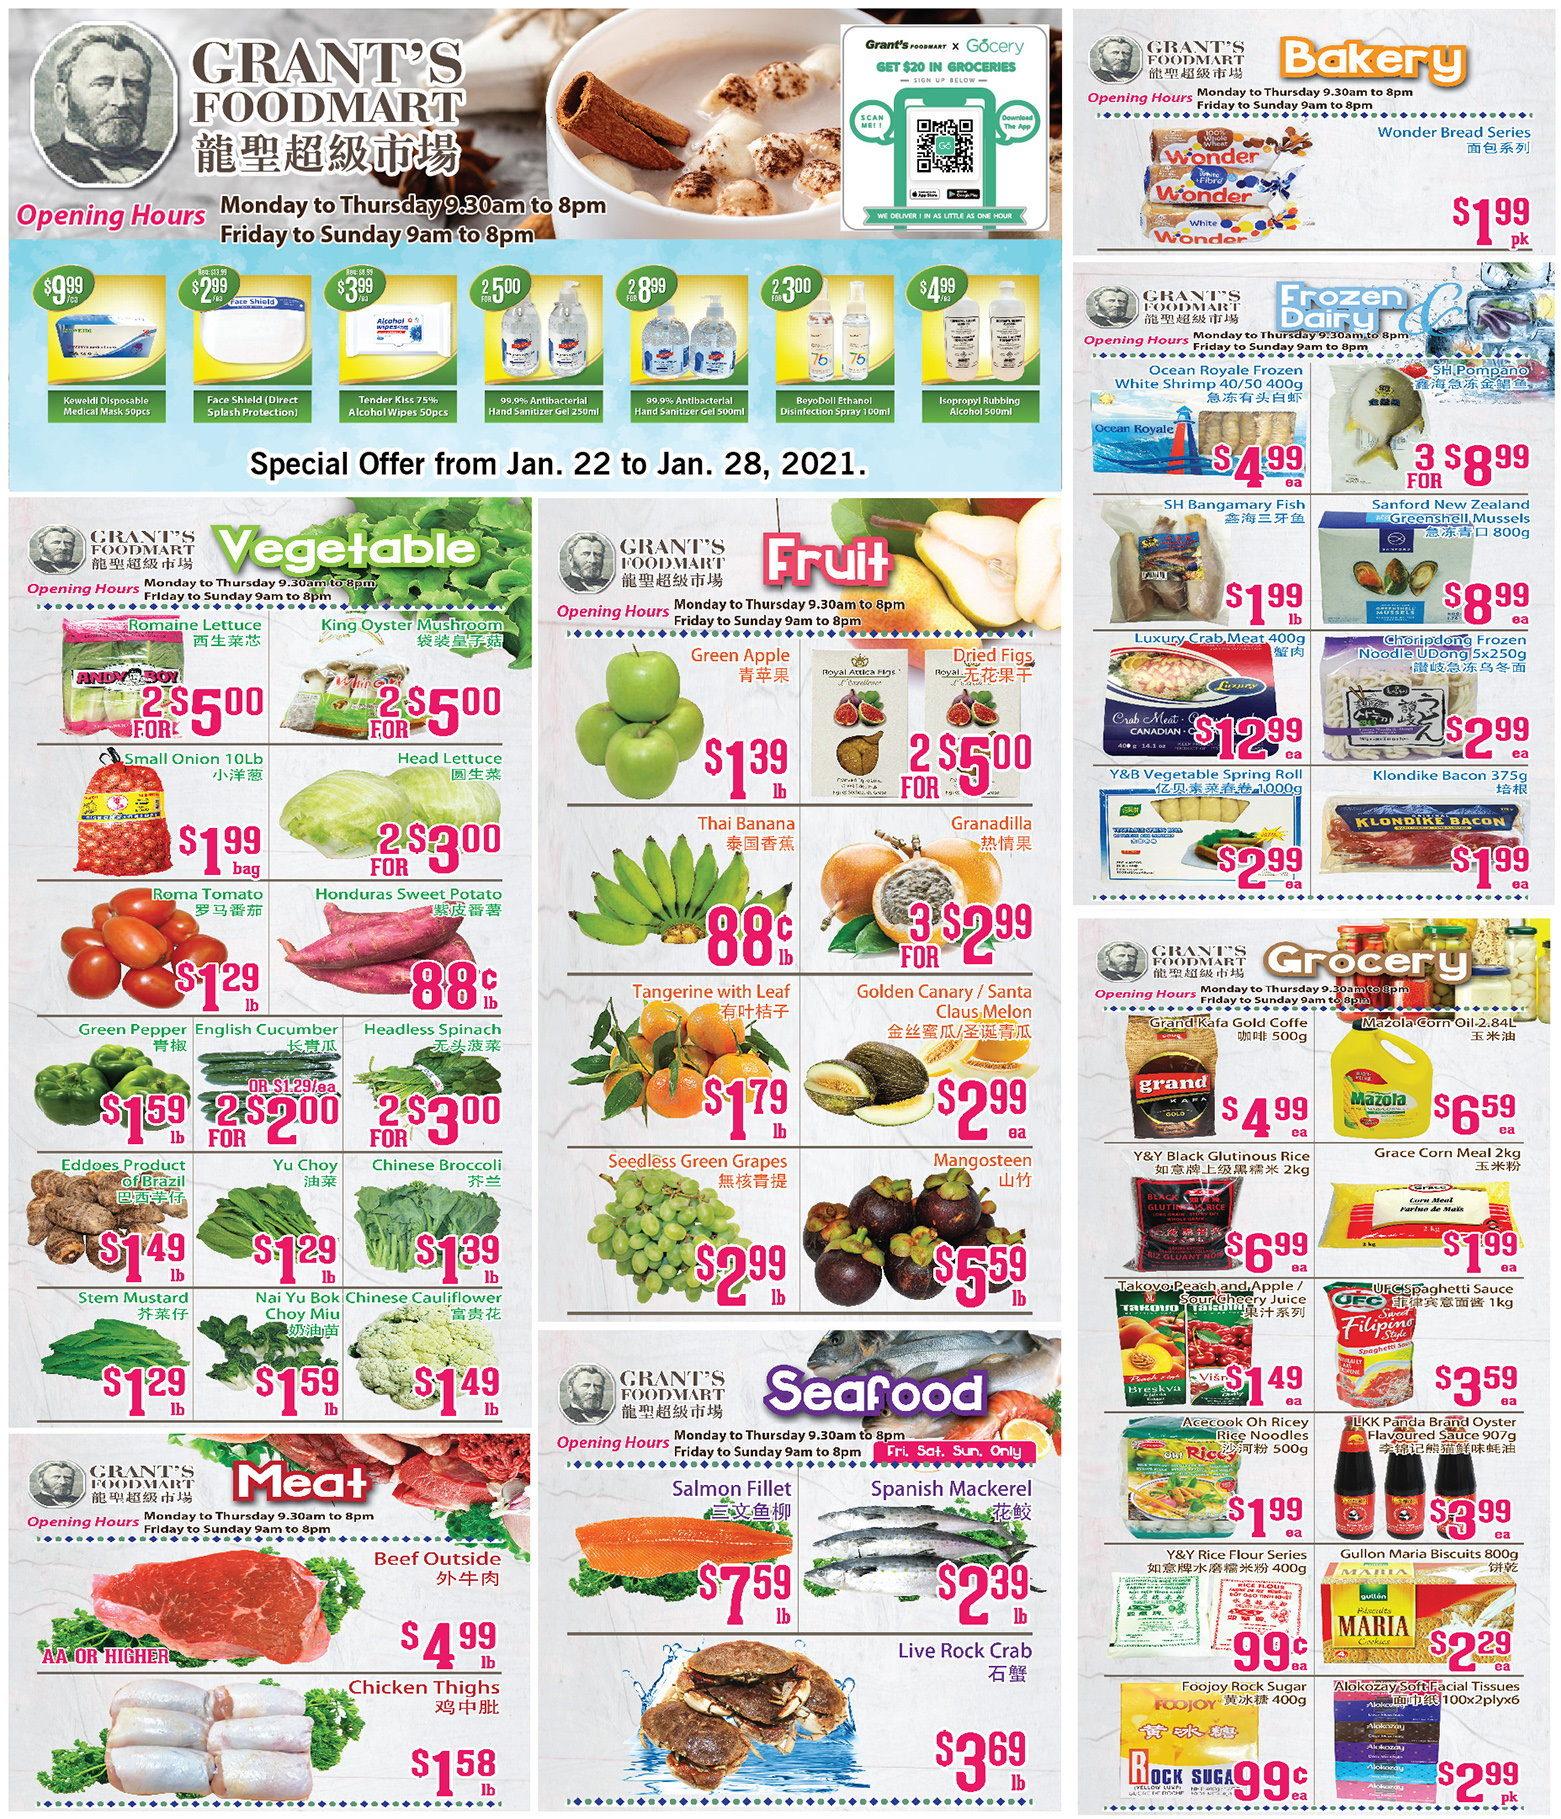 Oceans Fresh Food Market - Weekly Flyer Specials